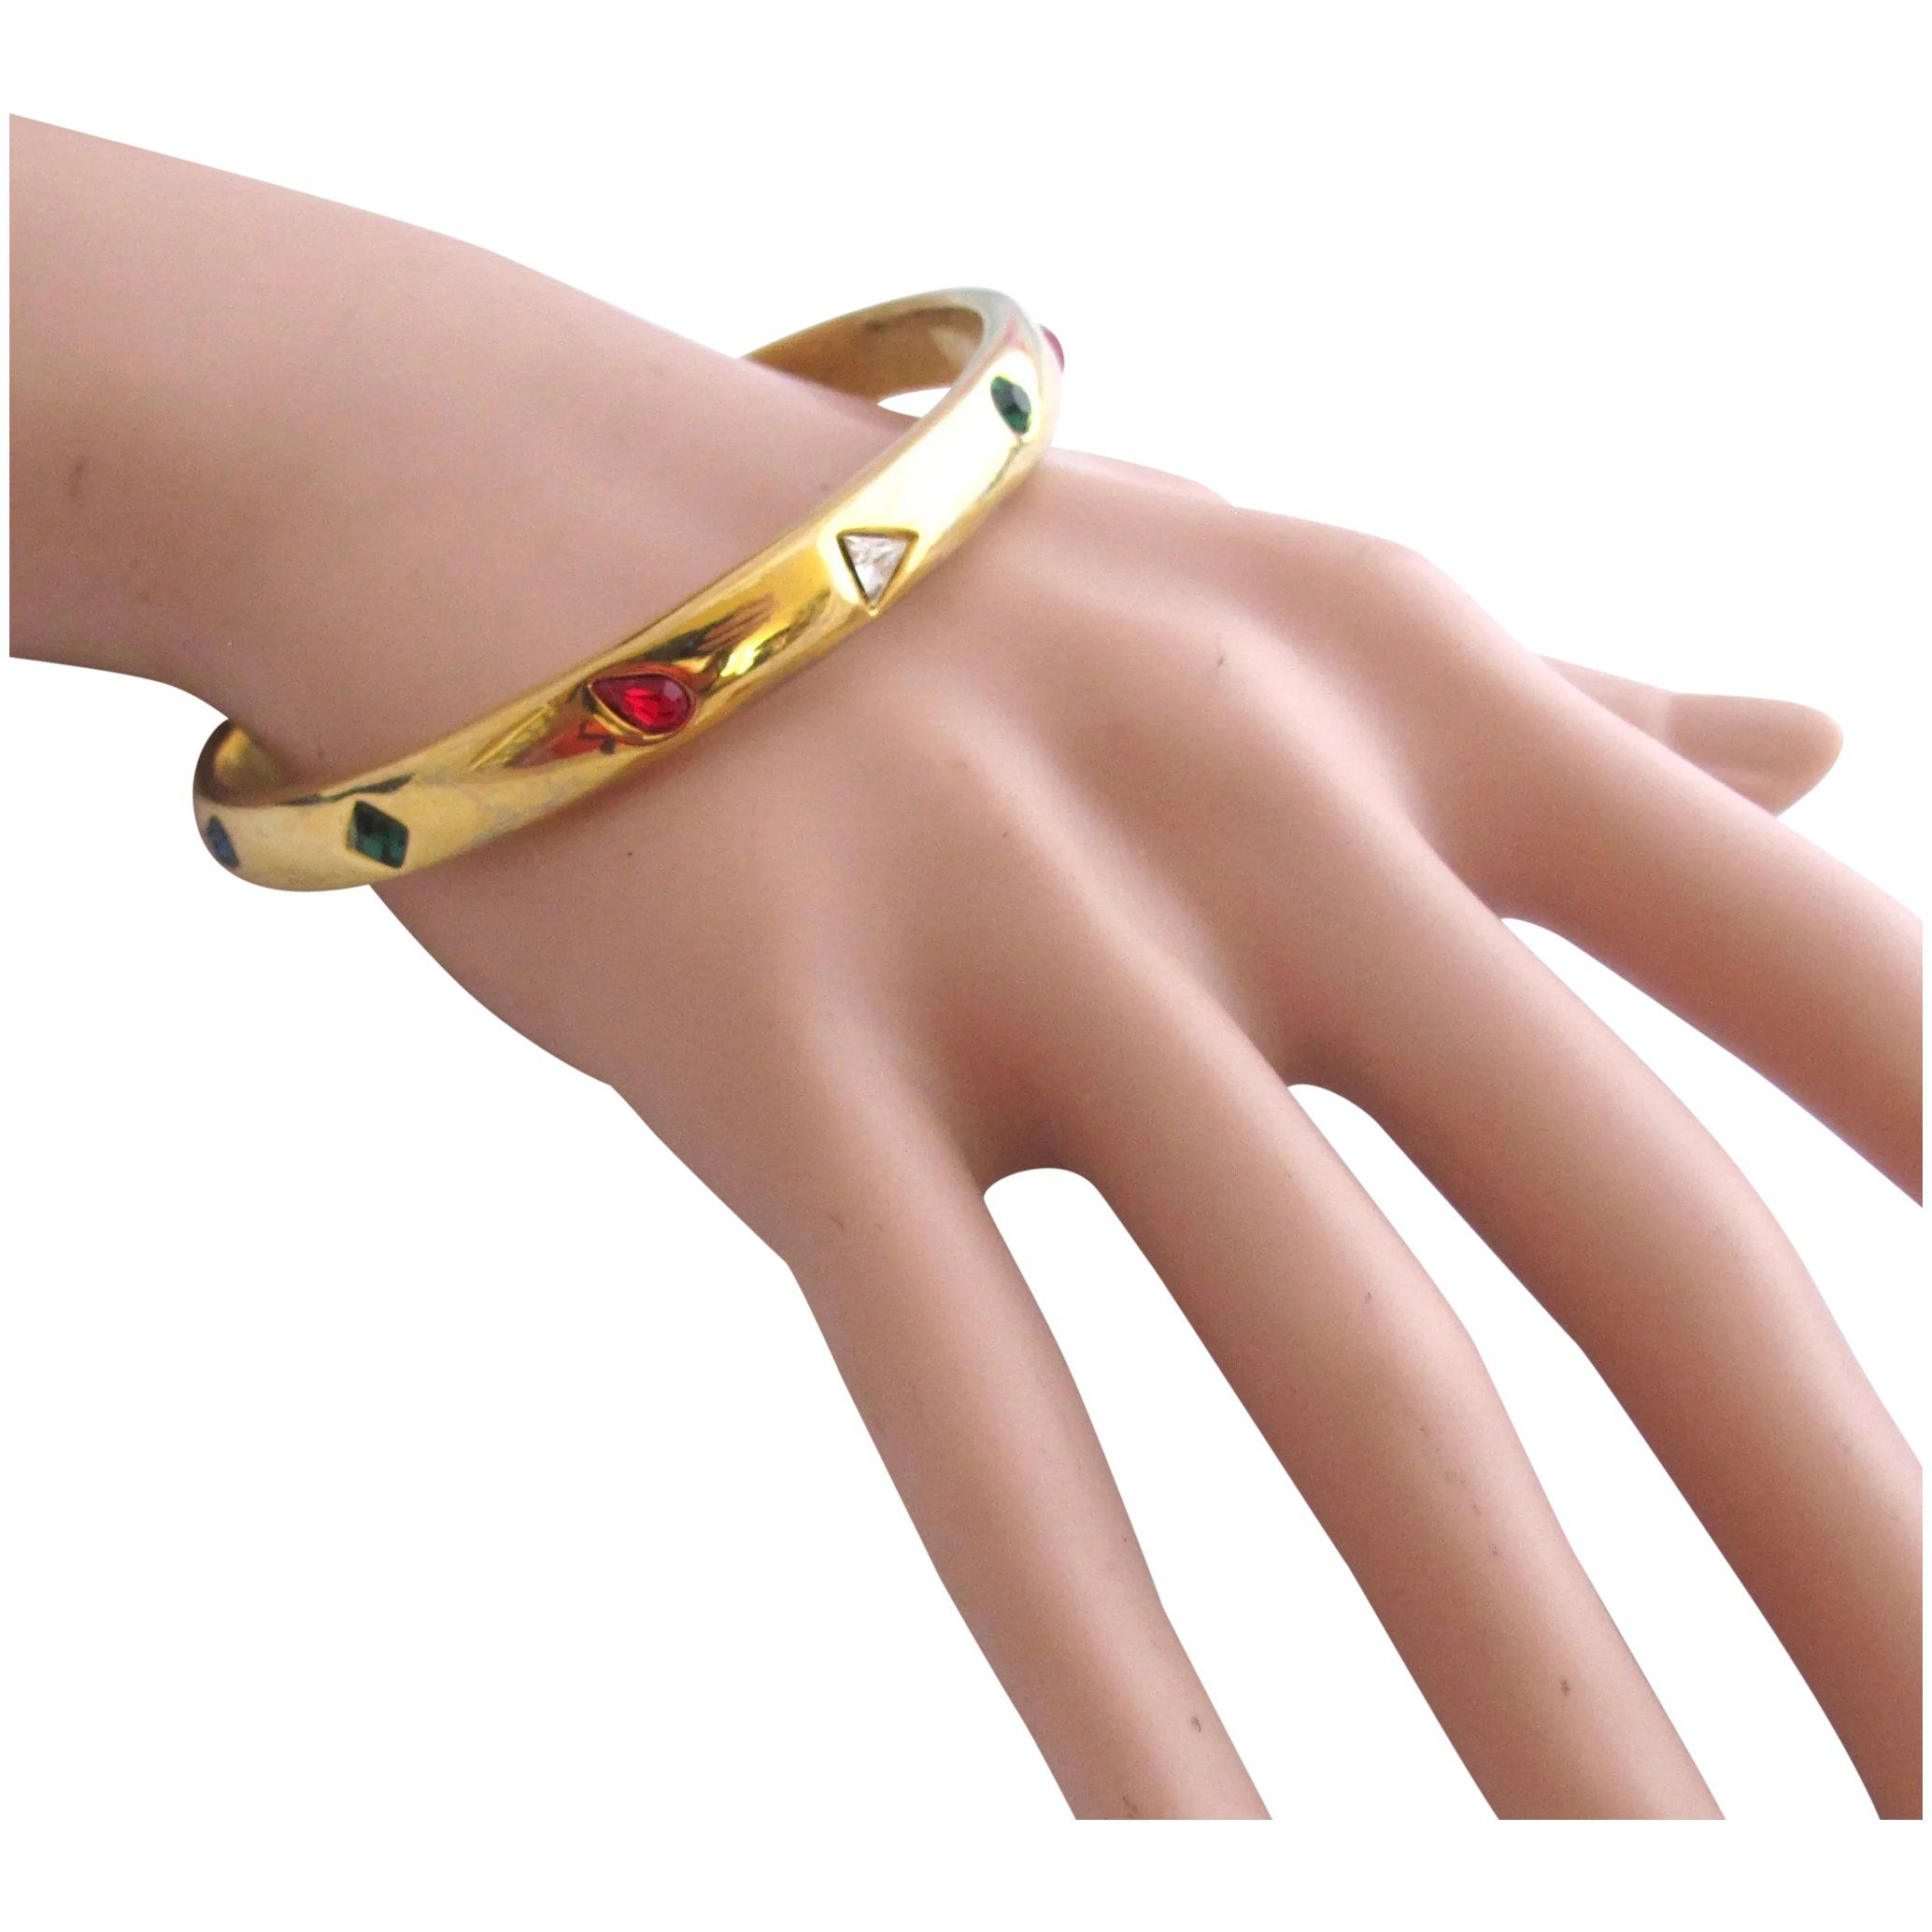 Womens Antique Gold Tone Metallic Beaded Floral Flower Bangle Bracelet Wristband